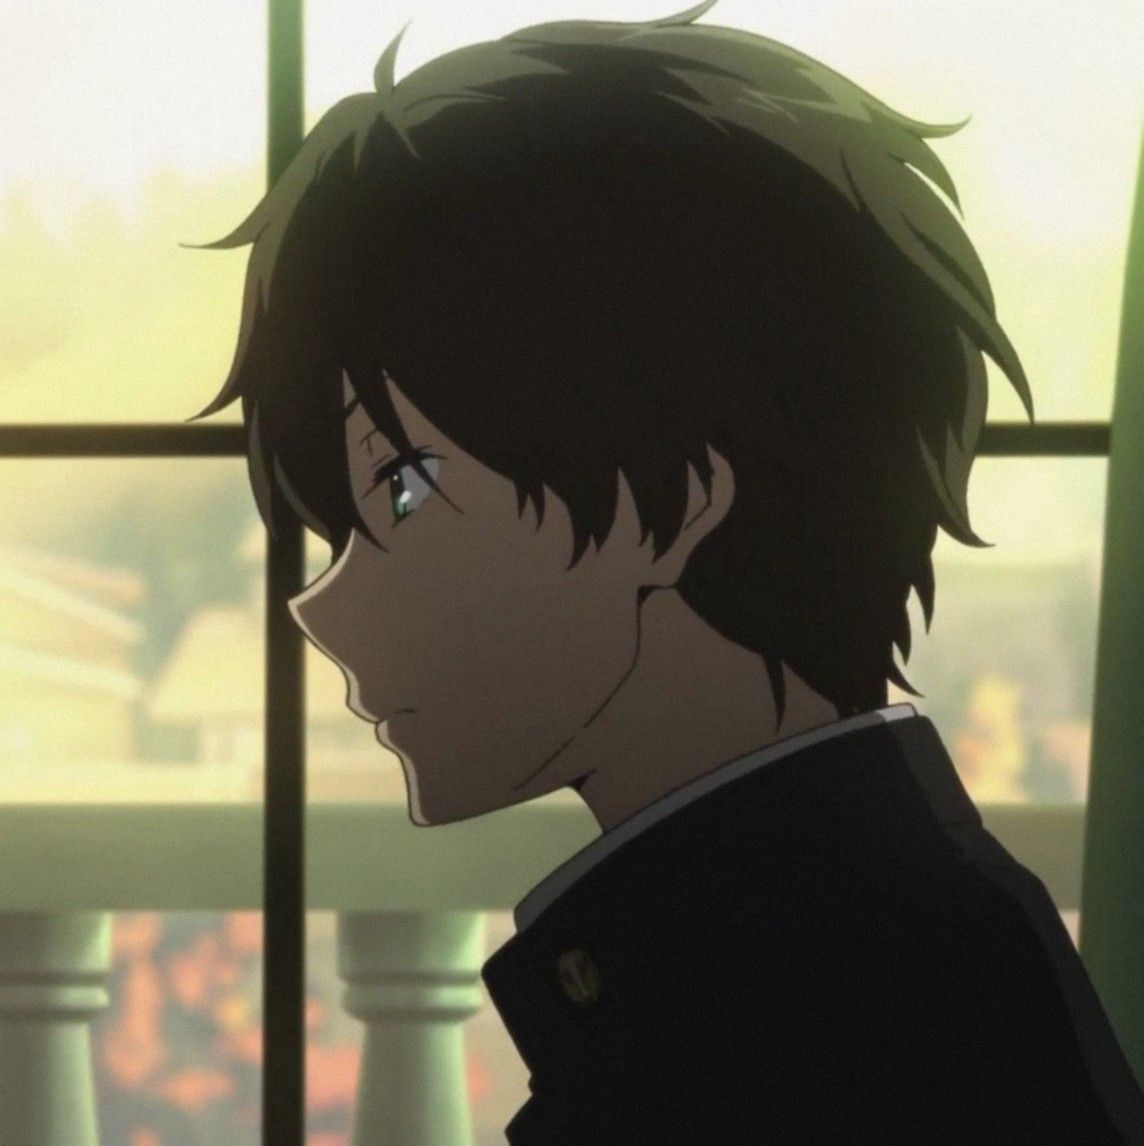 ʰʸᵒᵘᵏᵃ Hyouka Black Haired Anime Boy Anime Boyfriend